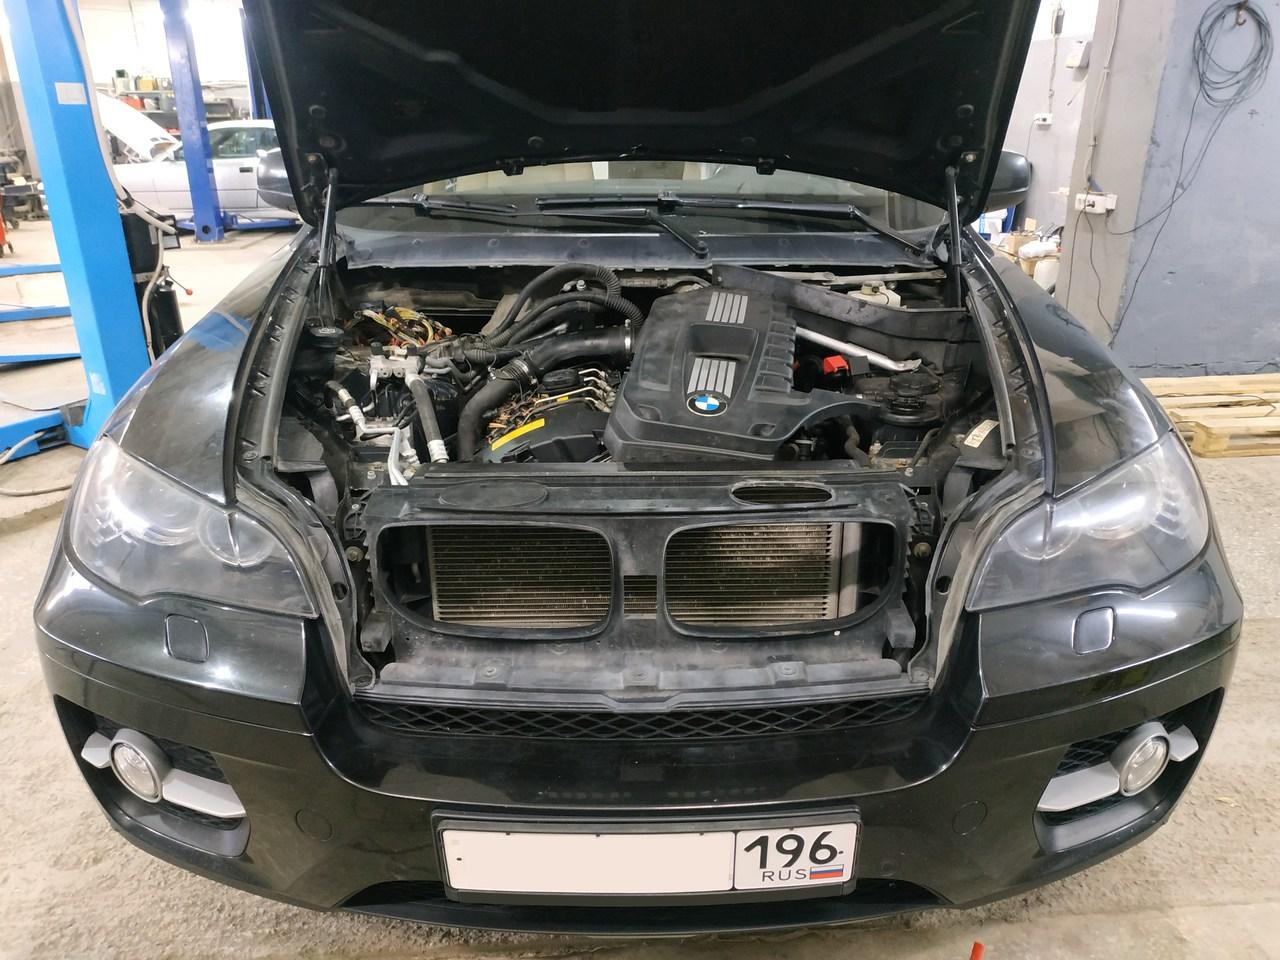 X6 E71 35i